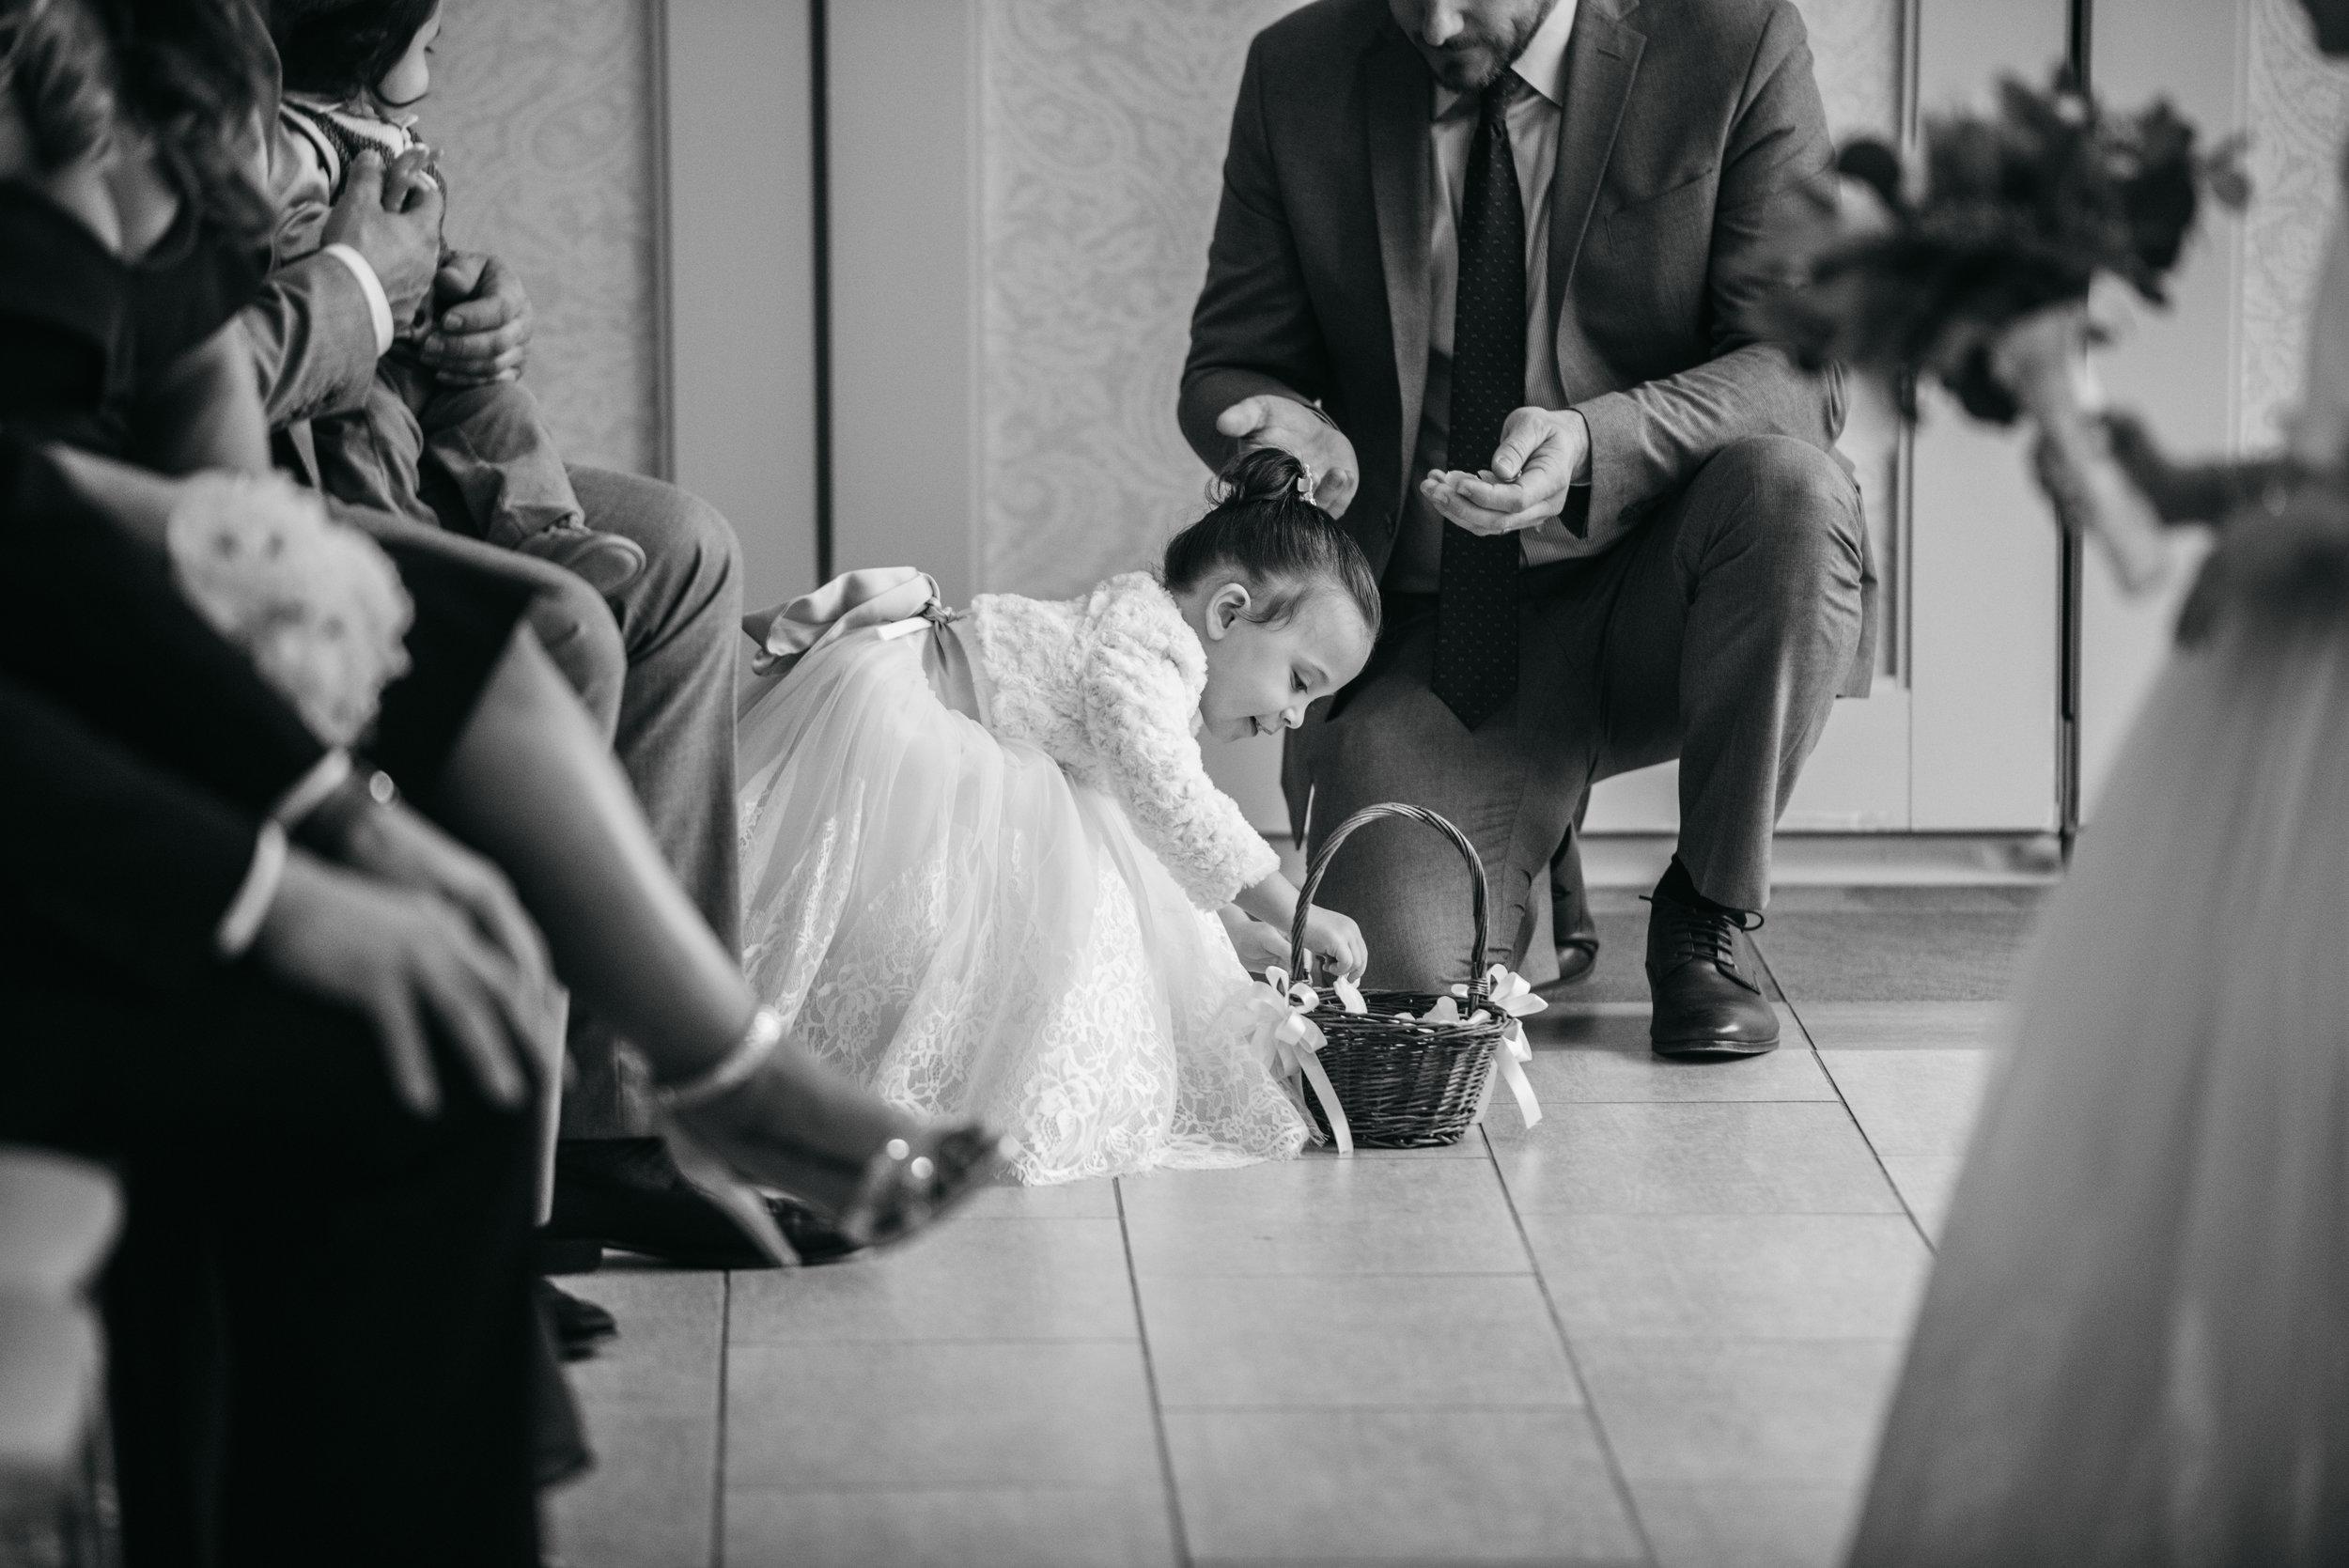 WeddingPhotos | NJPhotographer | Highlights-13-16.jpg